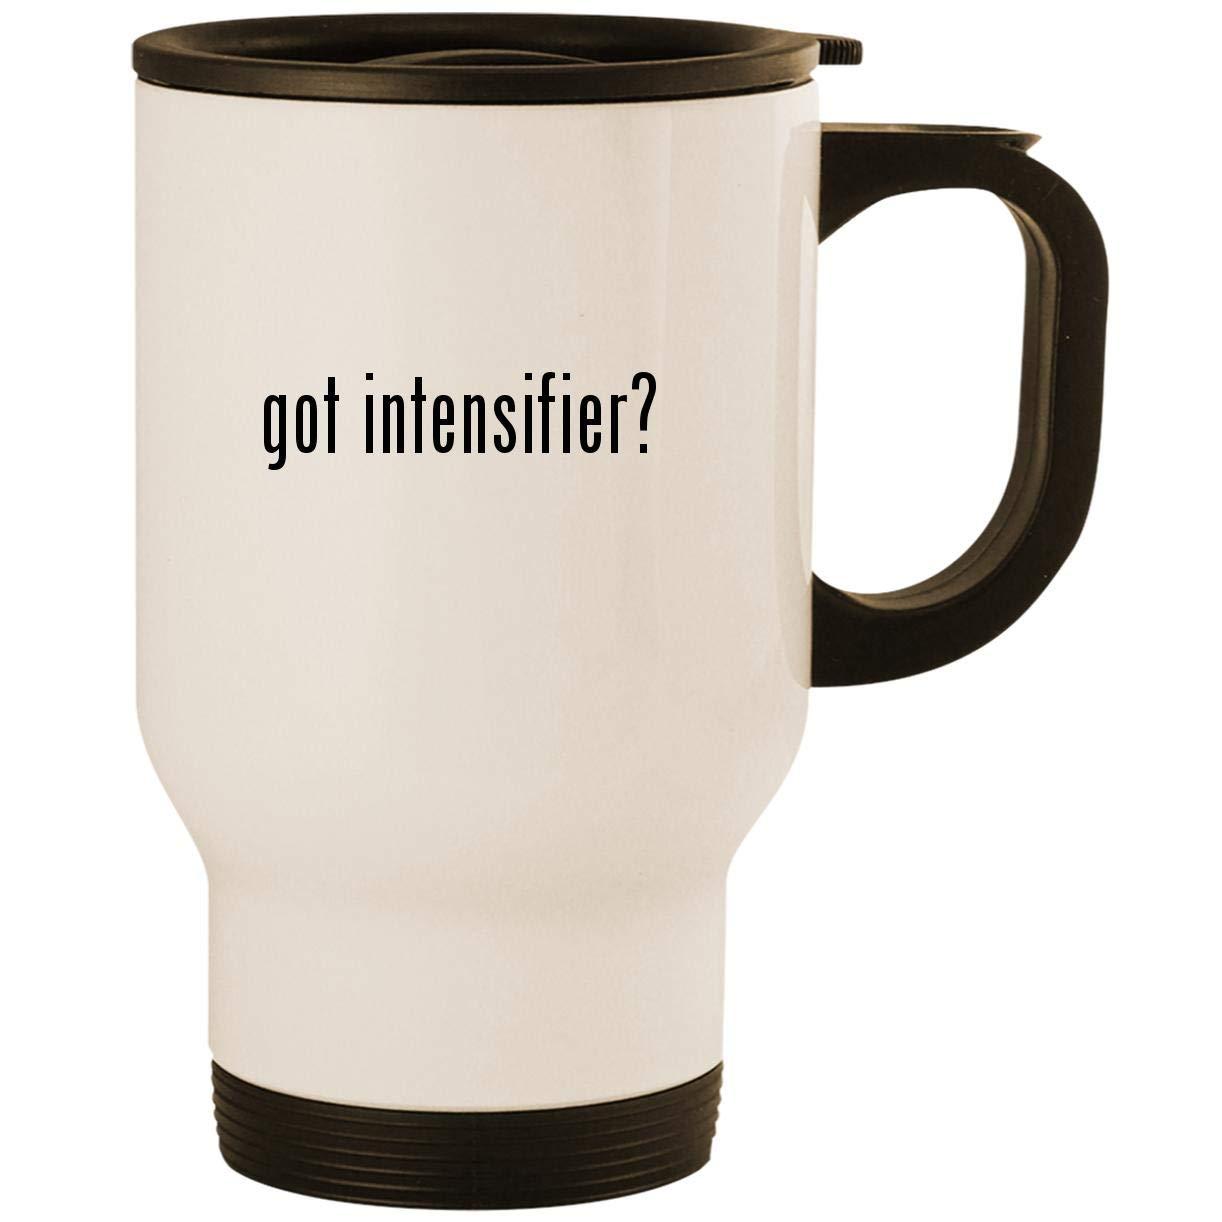 got intensifier? - Stainless Steel 14oz Road Ready Travel Mug, White